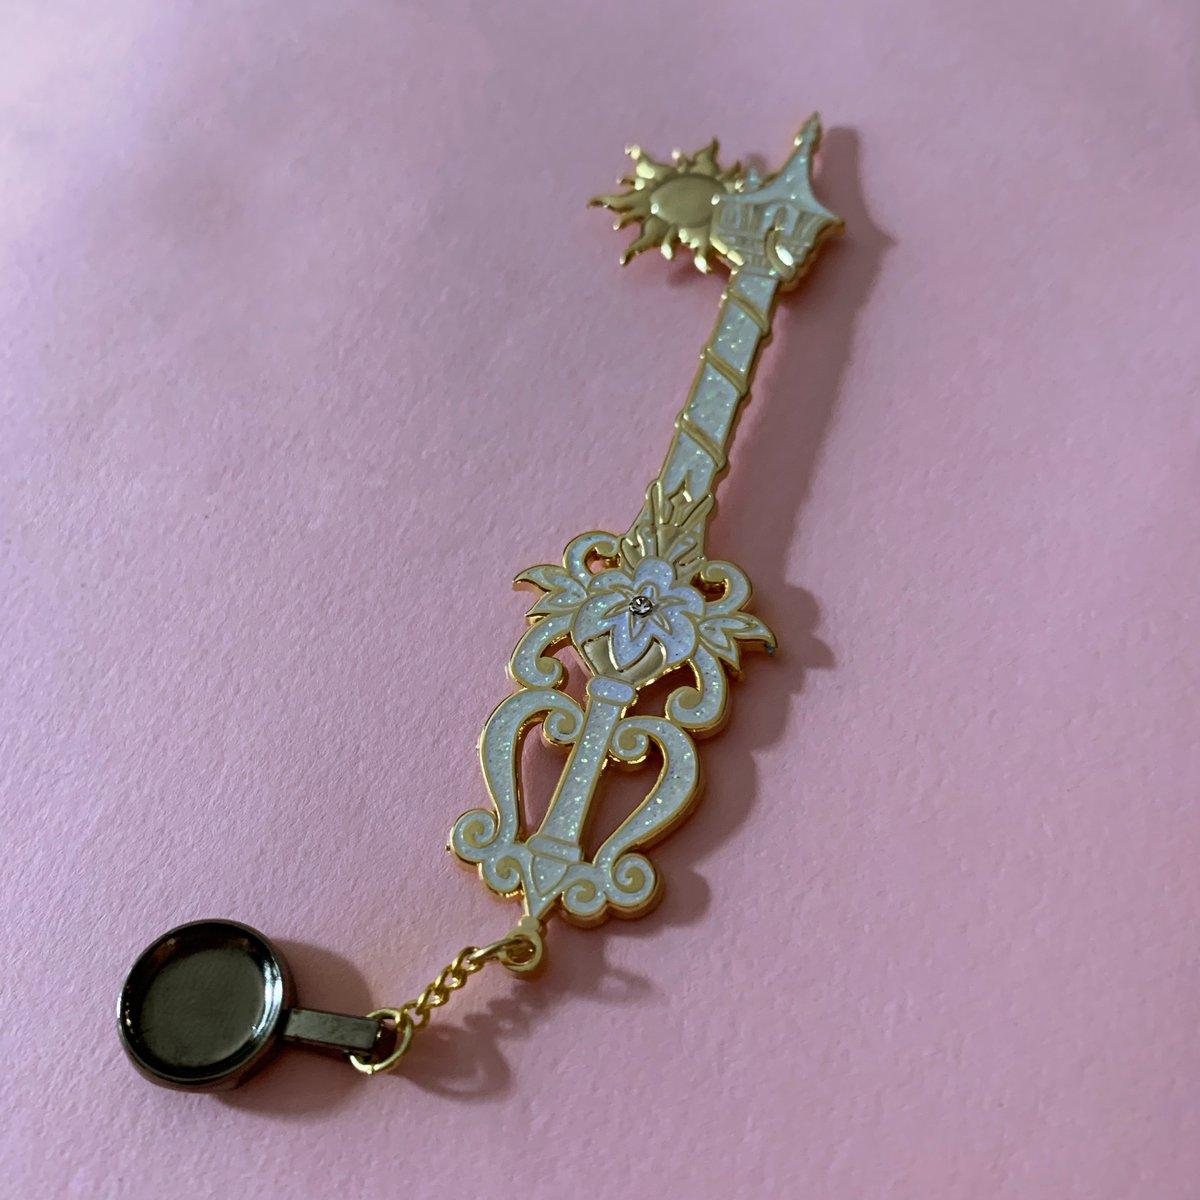 Image of Tangled Keyblade